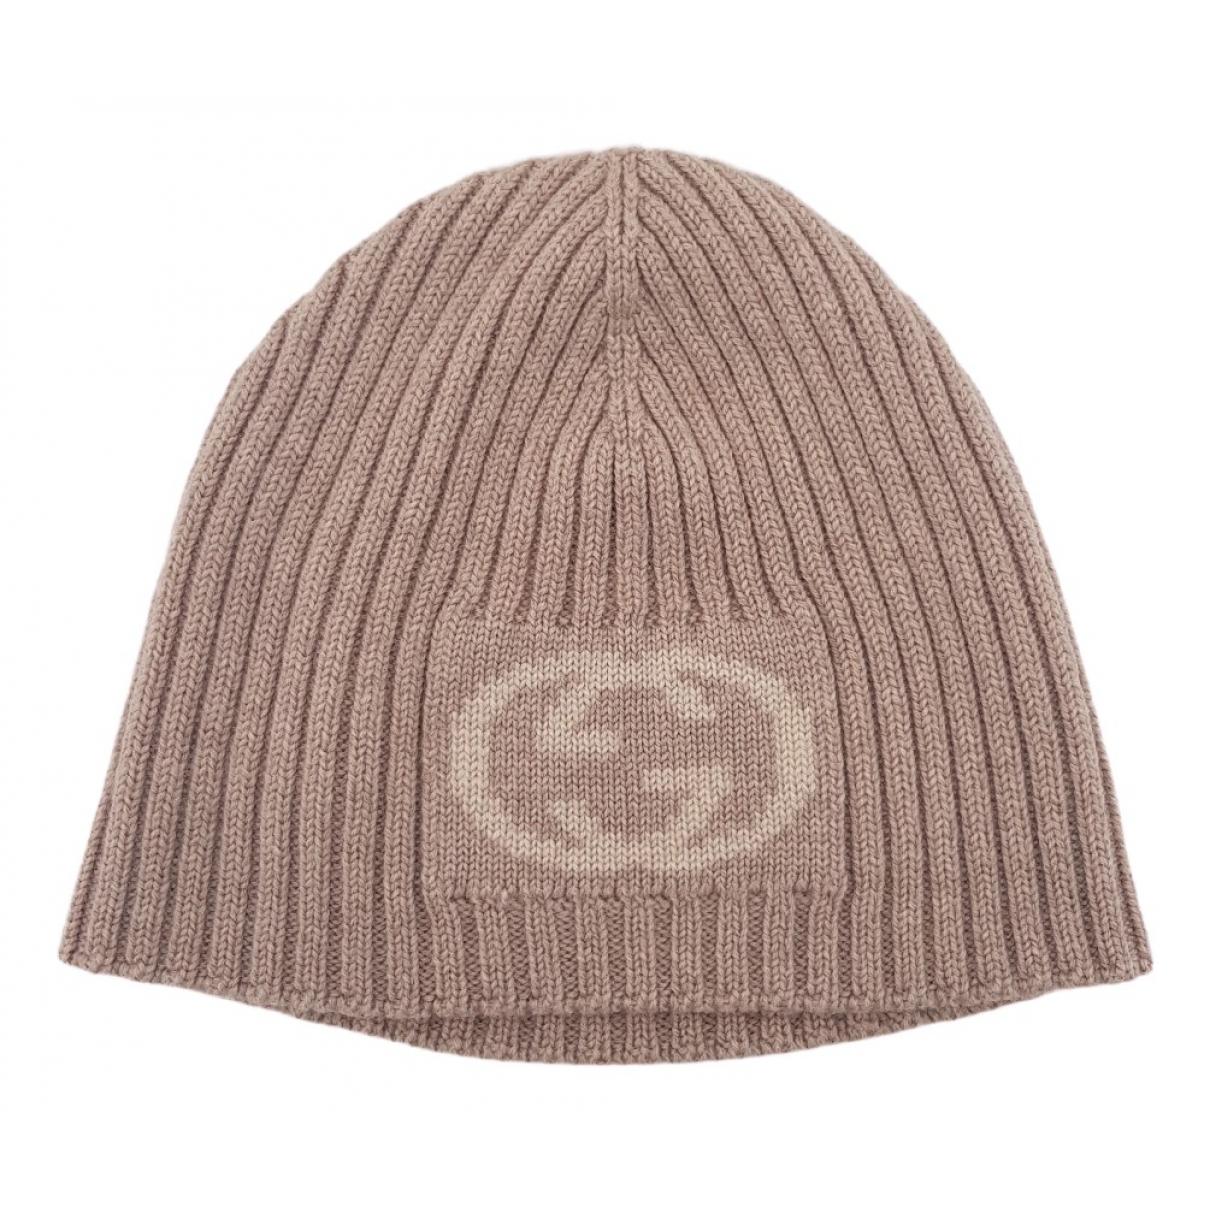 Gucci \N Grey Wool hat & pull on hat for Men M International